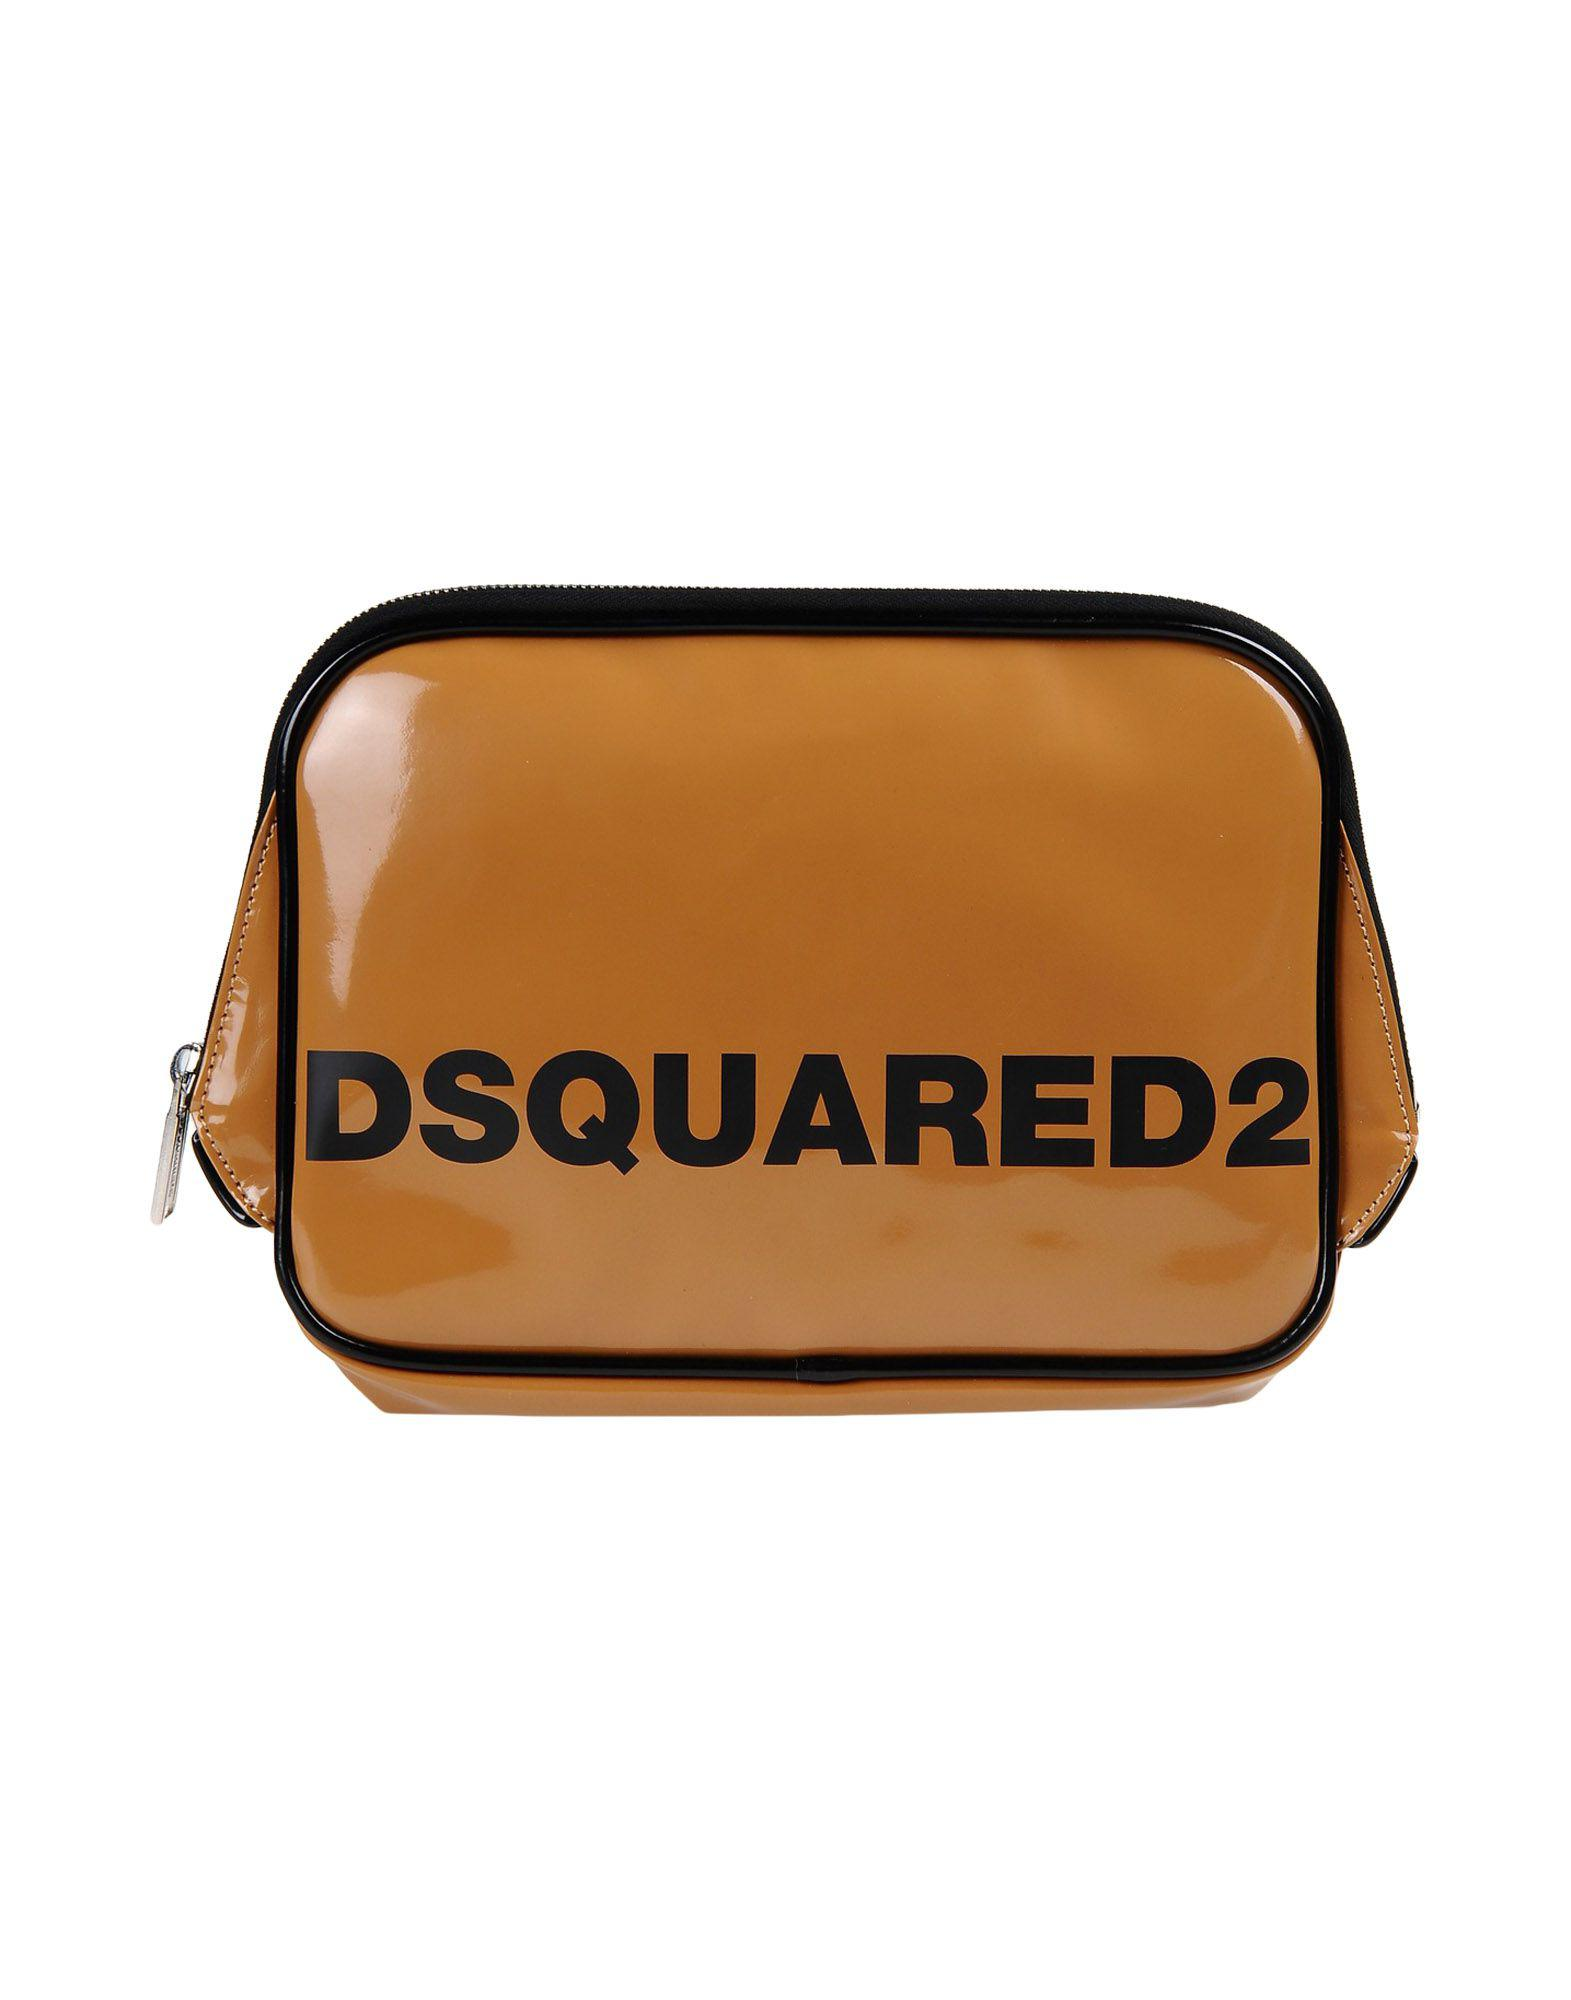 Dsquared2 LUGGAGE - Beauty cases su YOOX.COM zviU1DSht